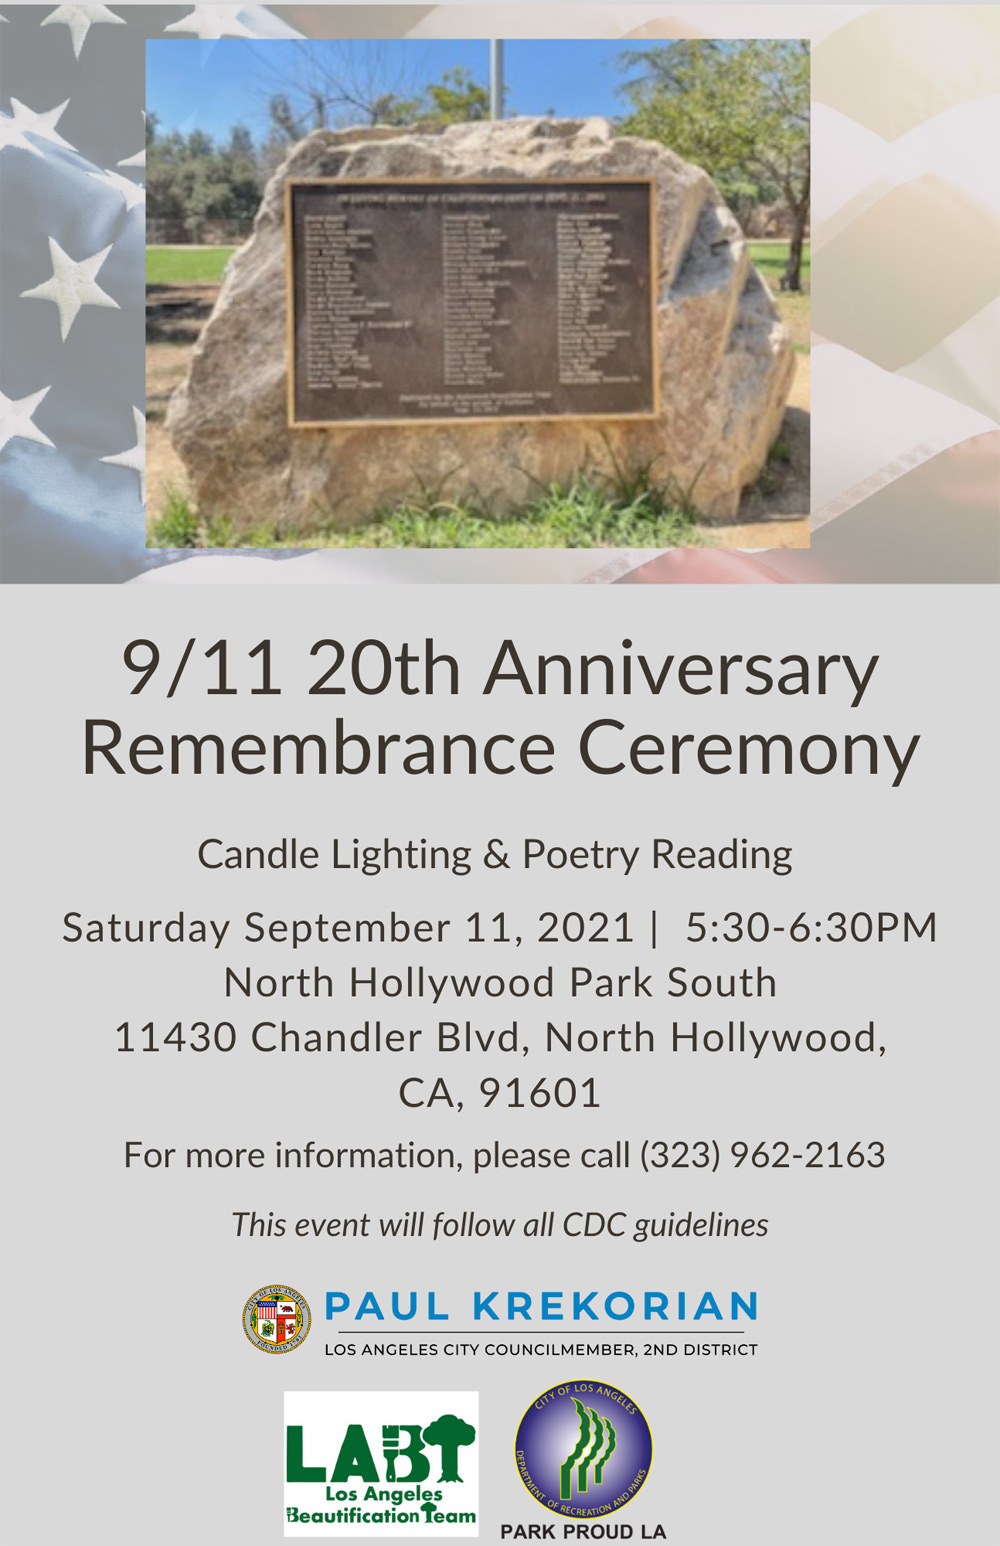 9/11 20th Anniversary Remembrance Ceremony